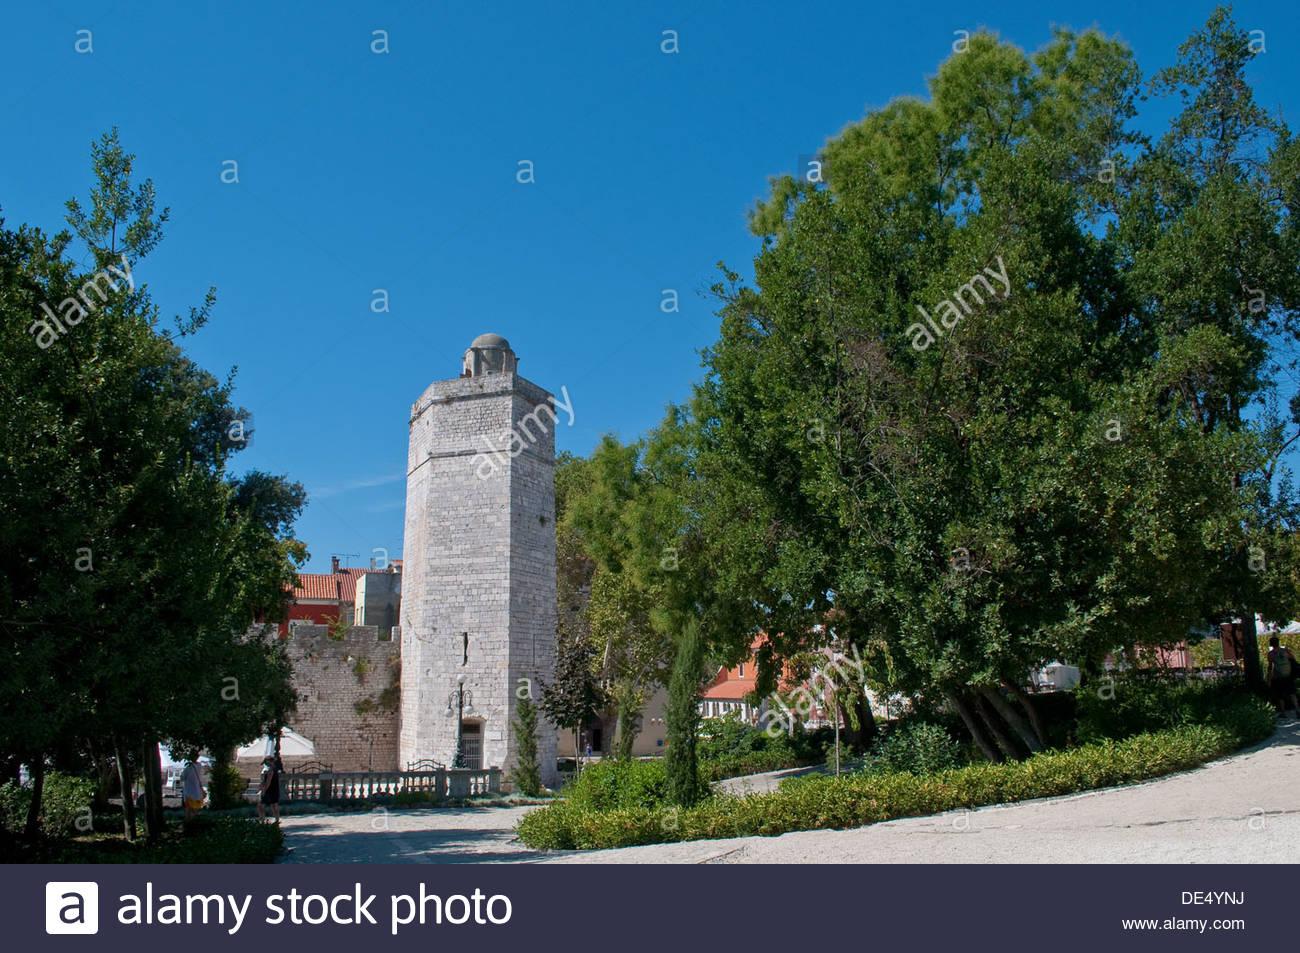 Captain's Tower and park of Queen Jelana, Zadar, Croatia - Stock Image